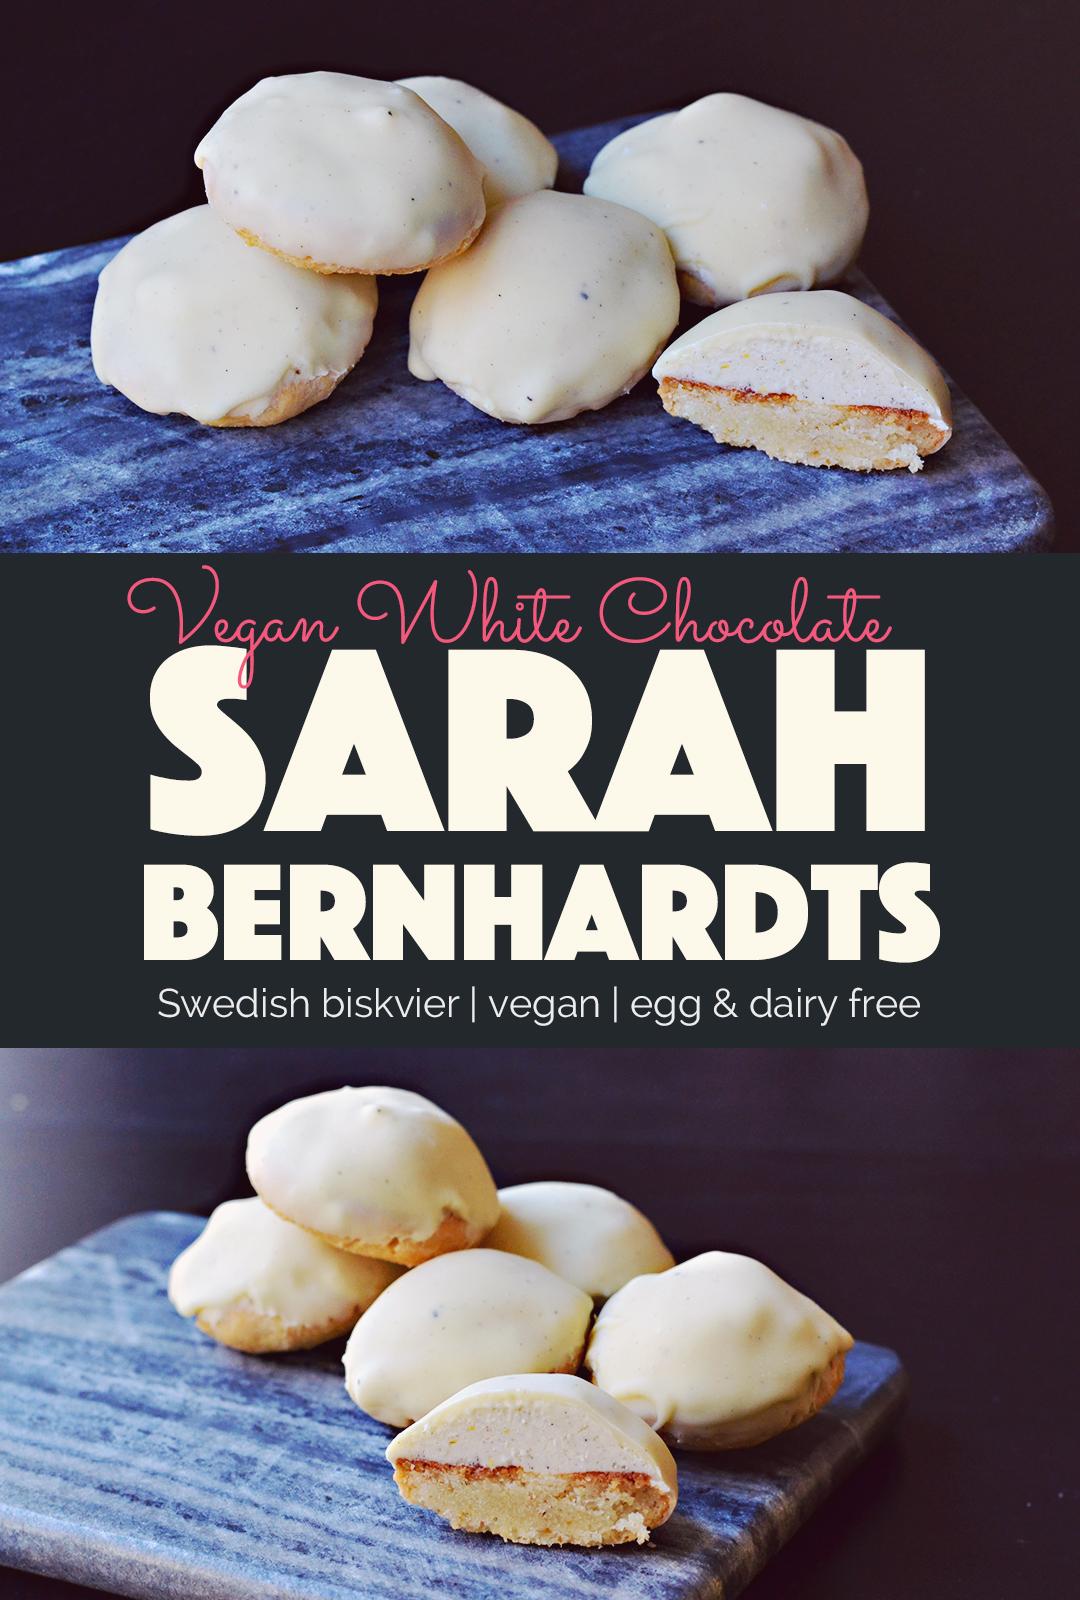 Vegan White Chocolate Biskvier Sarah Bernhardts |http://BananaBloom.com